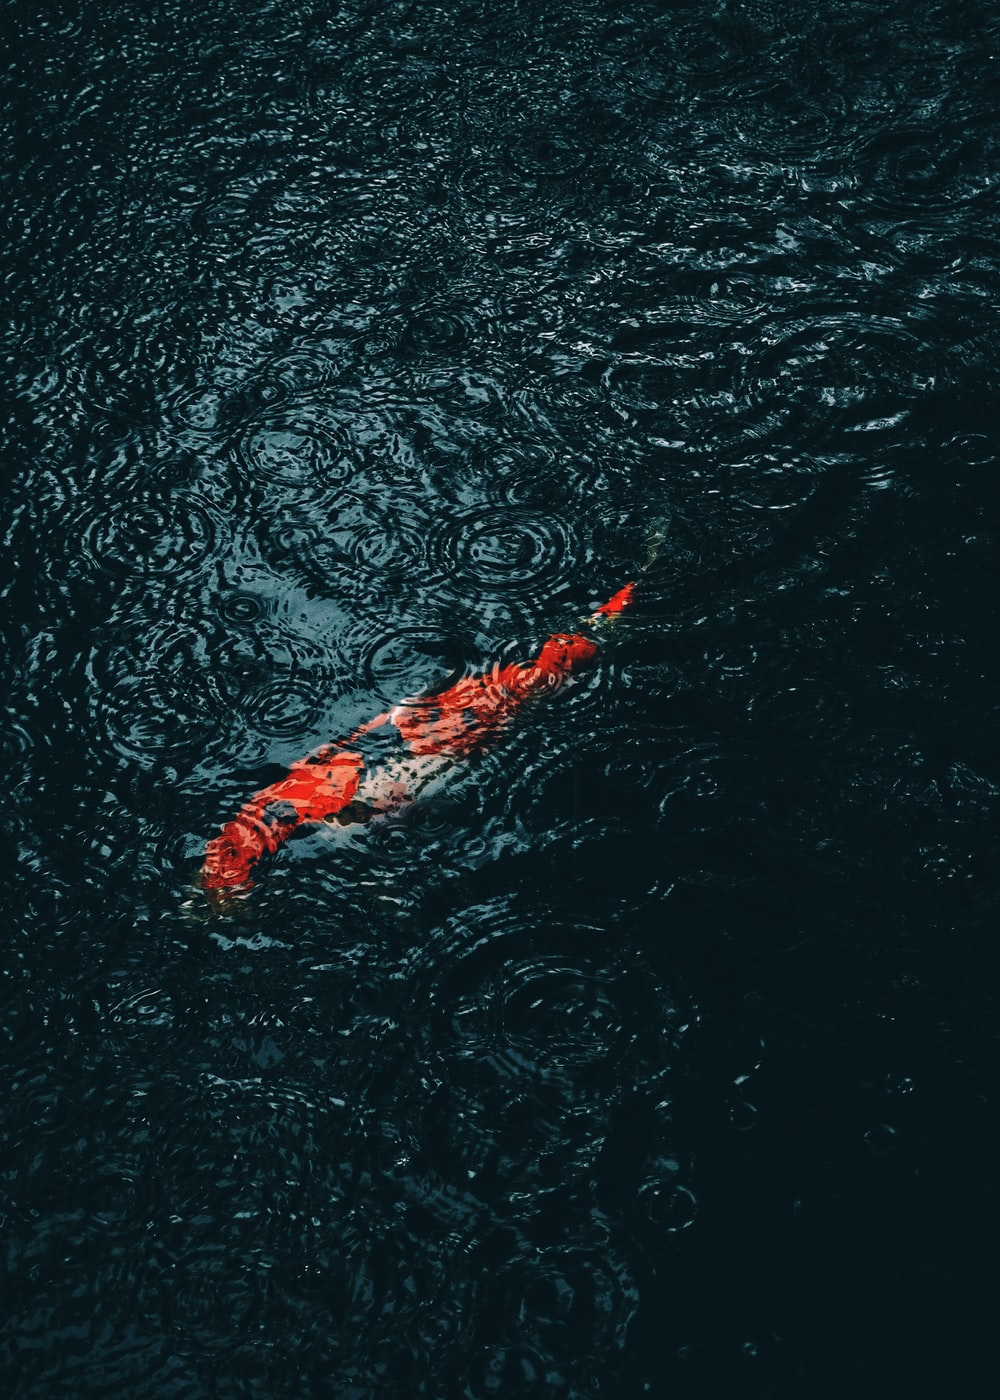 orange and white koi fish on water